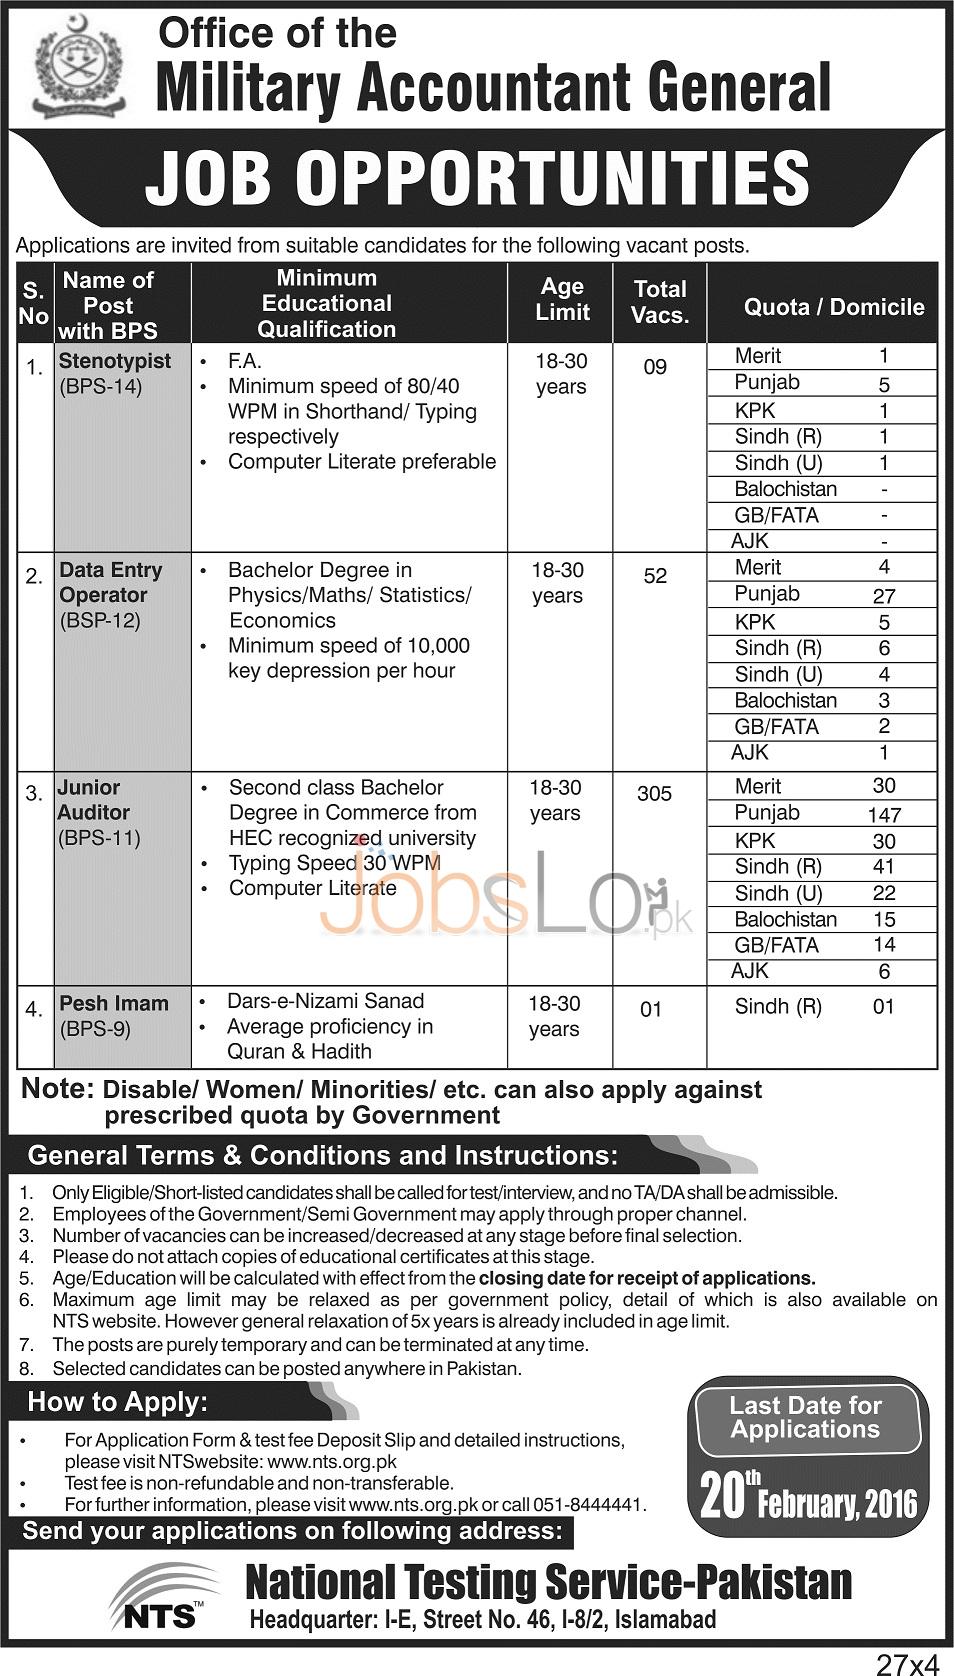 Military Accountant General  Vacancies in Sindh, FATA, Balochistan GB, KPK 30 Jan 2016